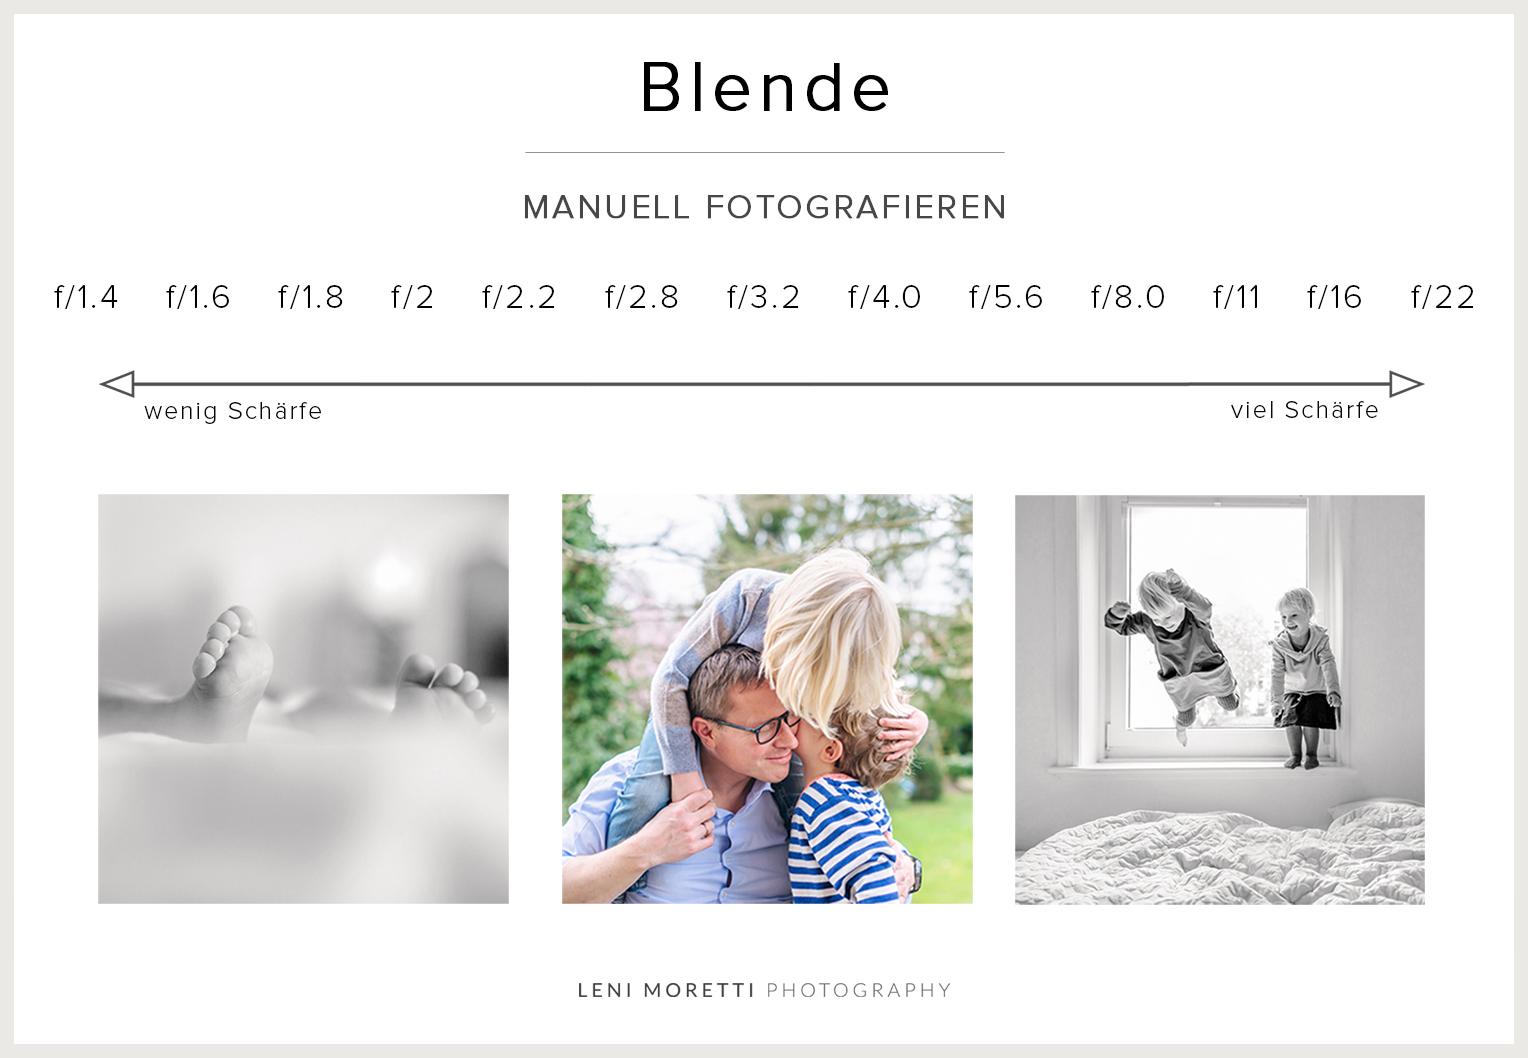 blende-spickzettel-pdf